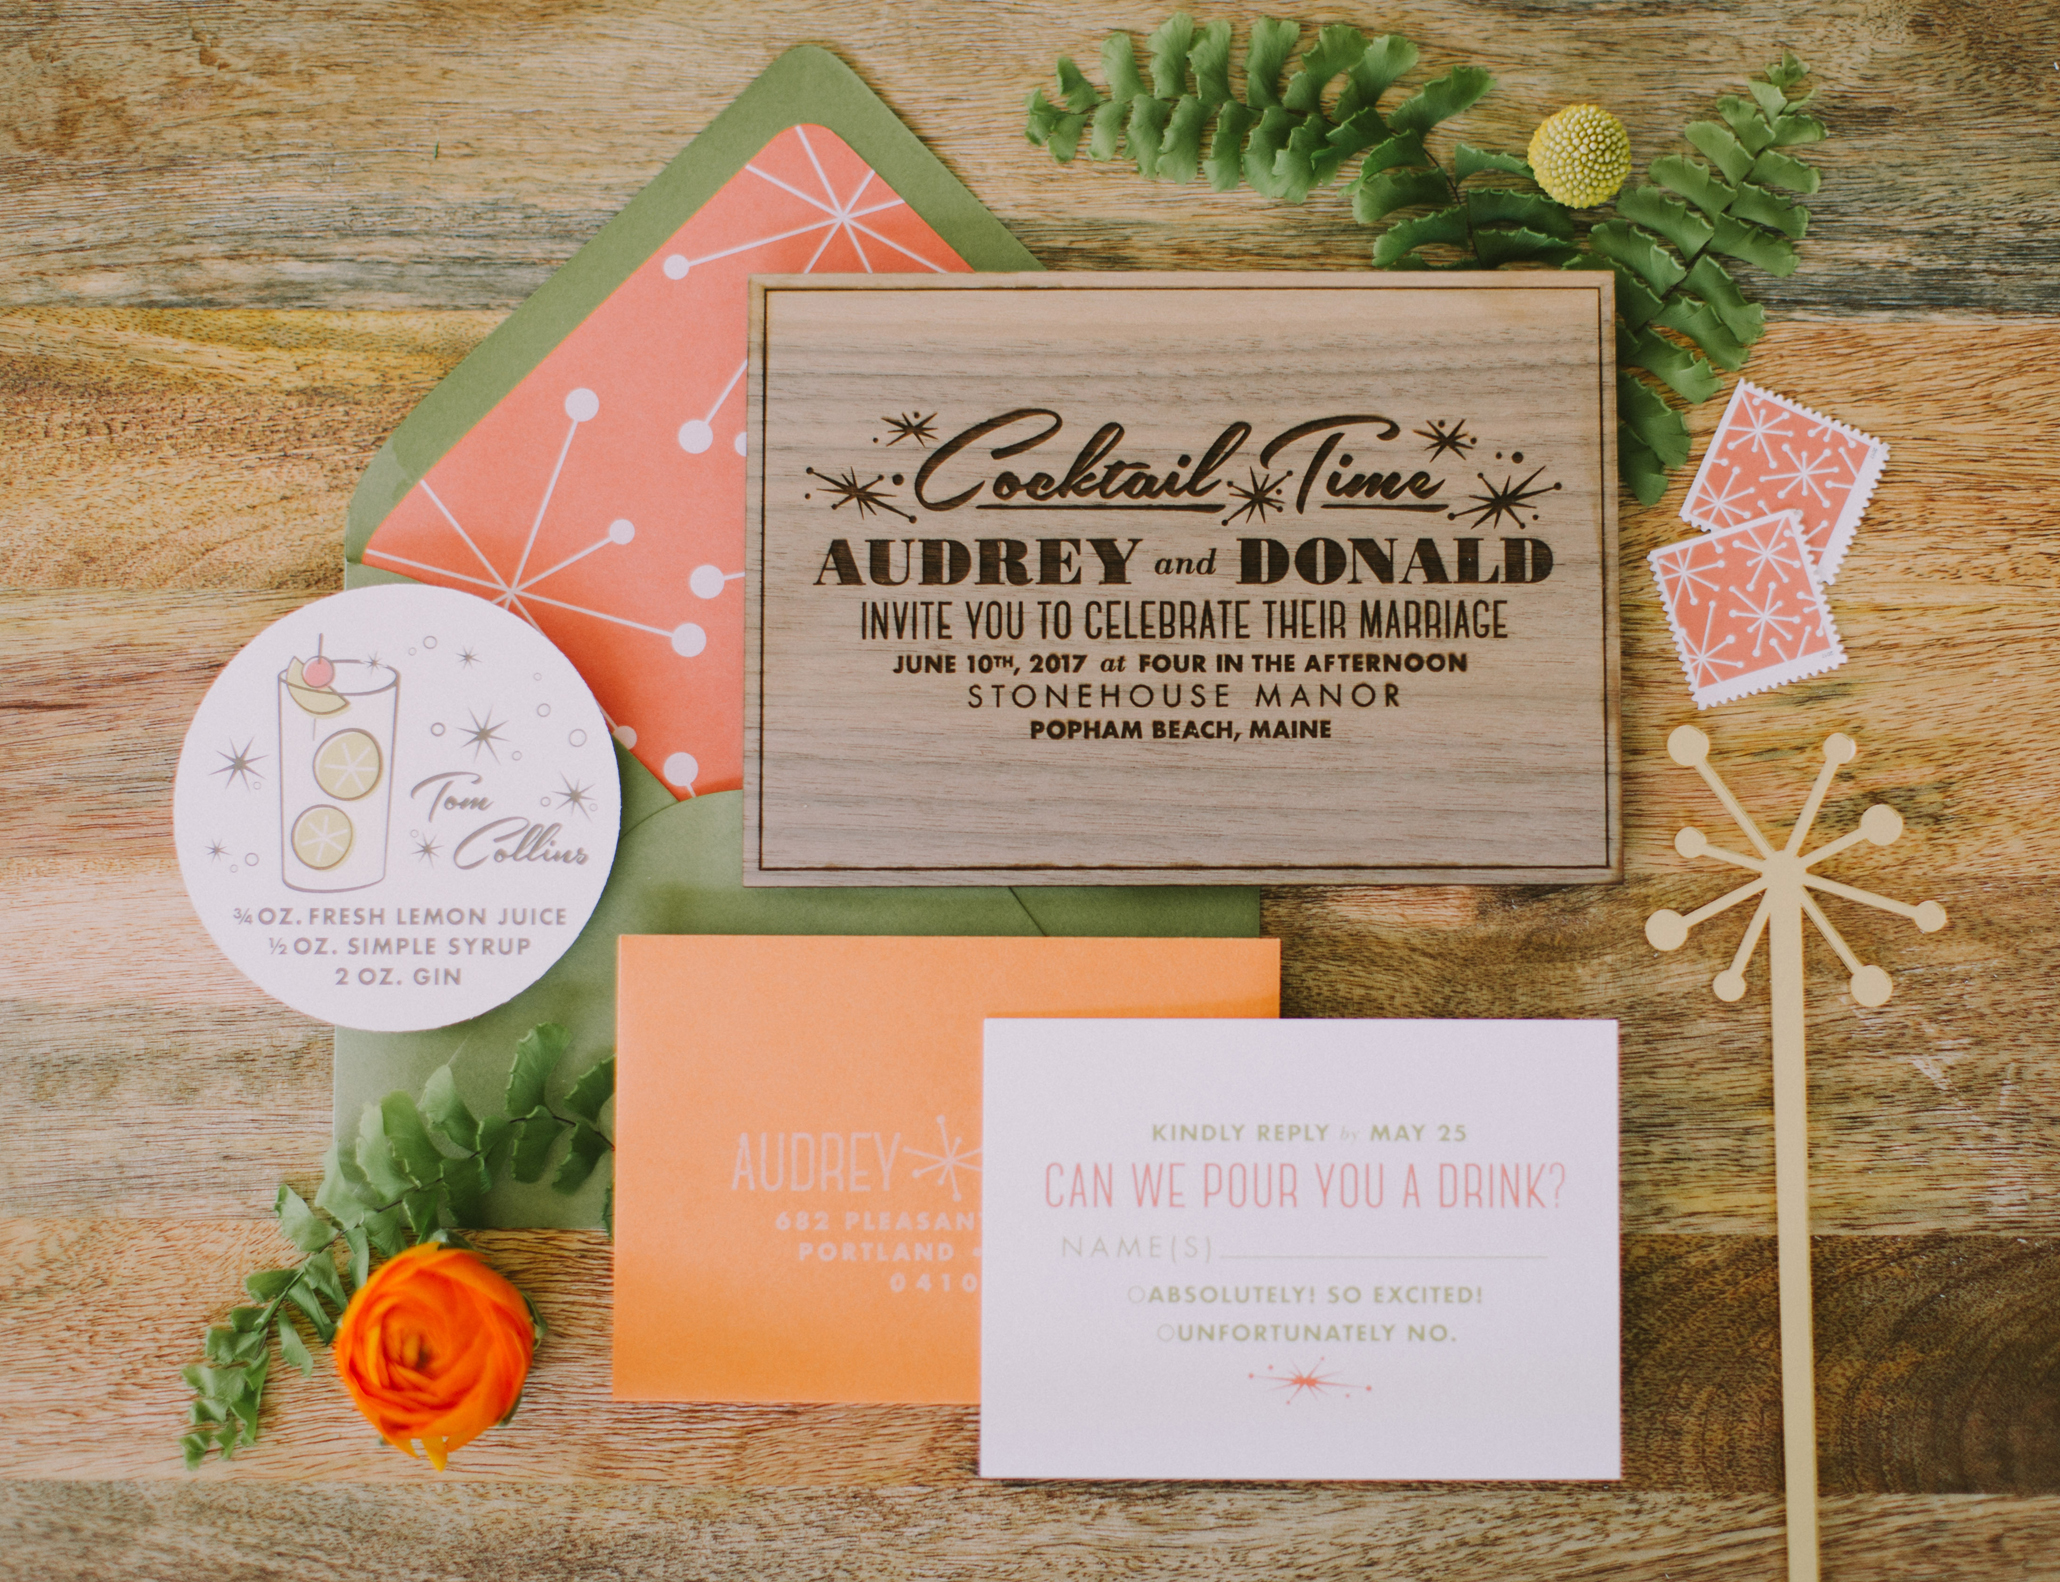 mid-century modern wedding invitation design, custom designed Las Vegas Palm Springs retro wedding invitation suite, luxury one of a kind original wedding invitation, fund and modern